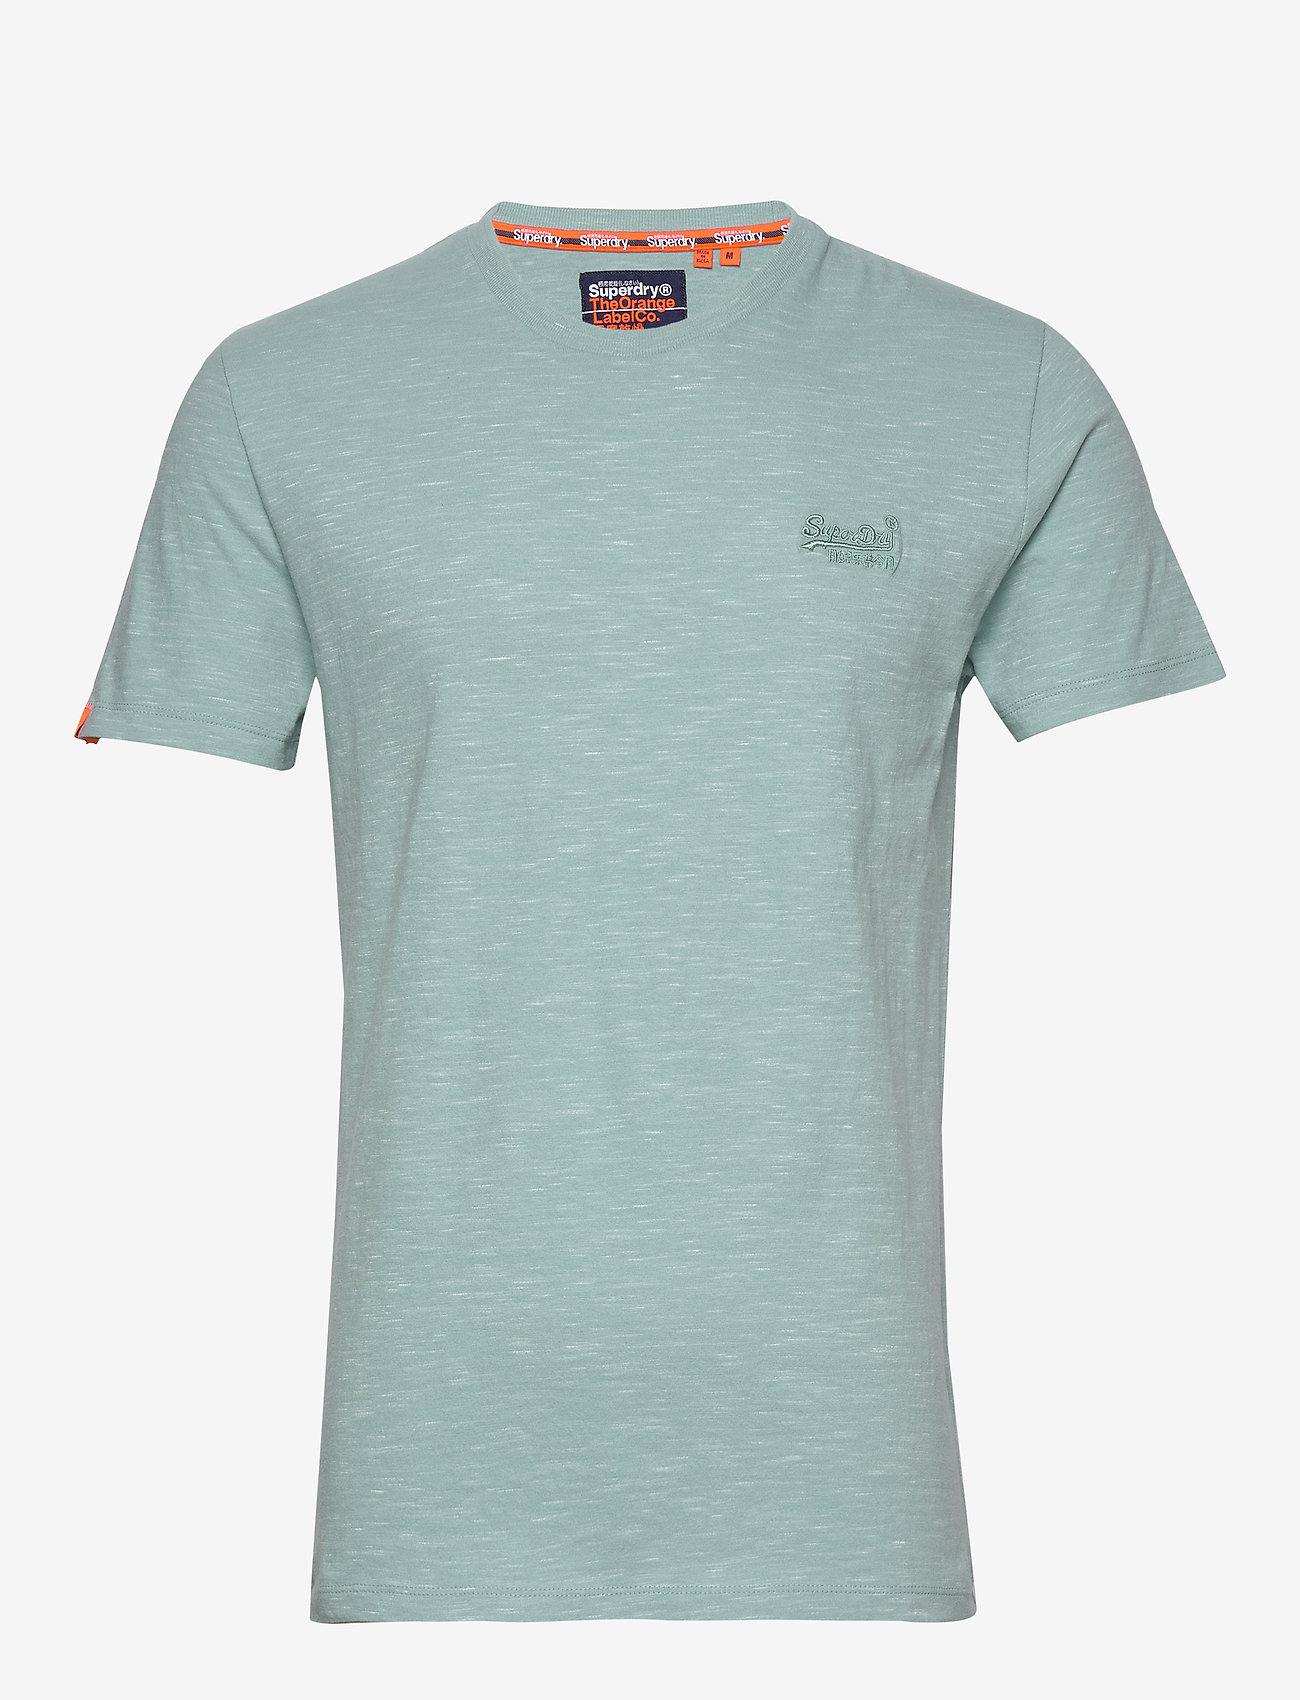 Superdry OL VINTAGE EMB CREW - T-shirts FRESH MINT SPACE DYE EvQp5GXj